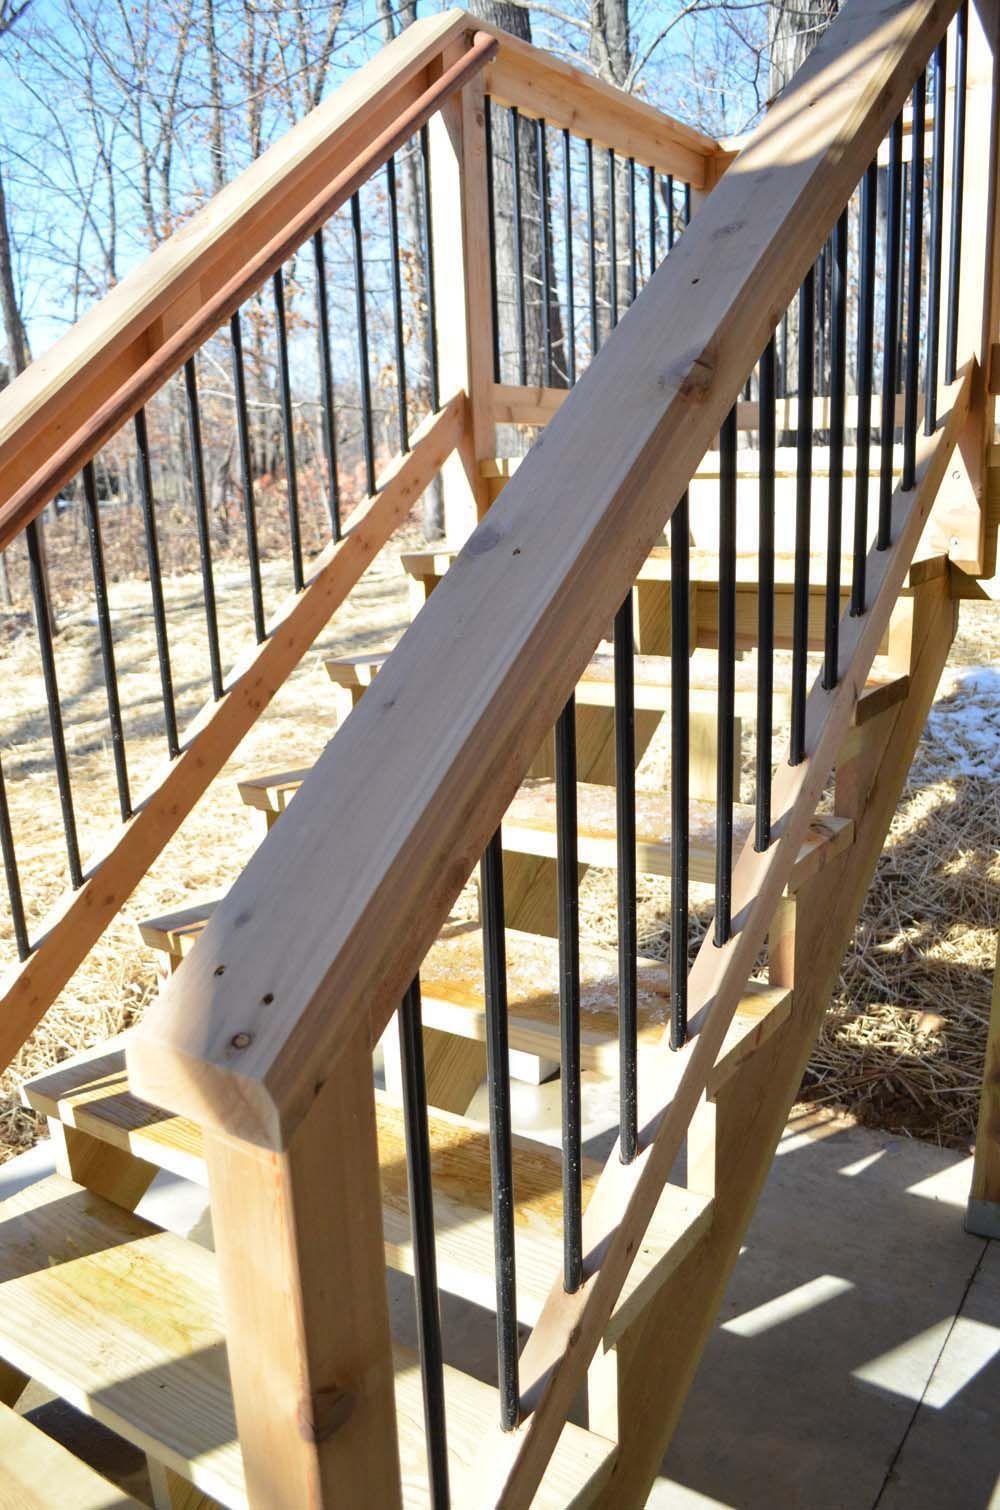 Best Deck Rail Cedar W Aluminum Spindles For The Home 400 x 300